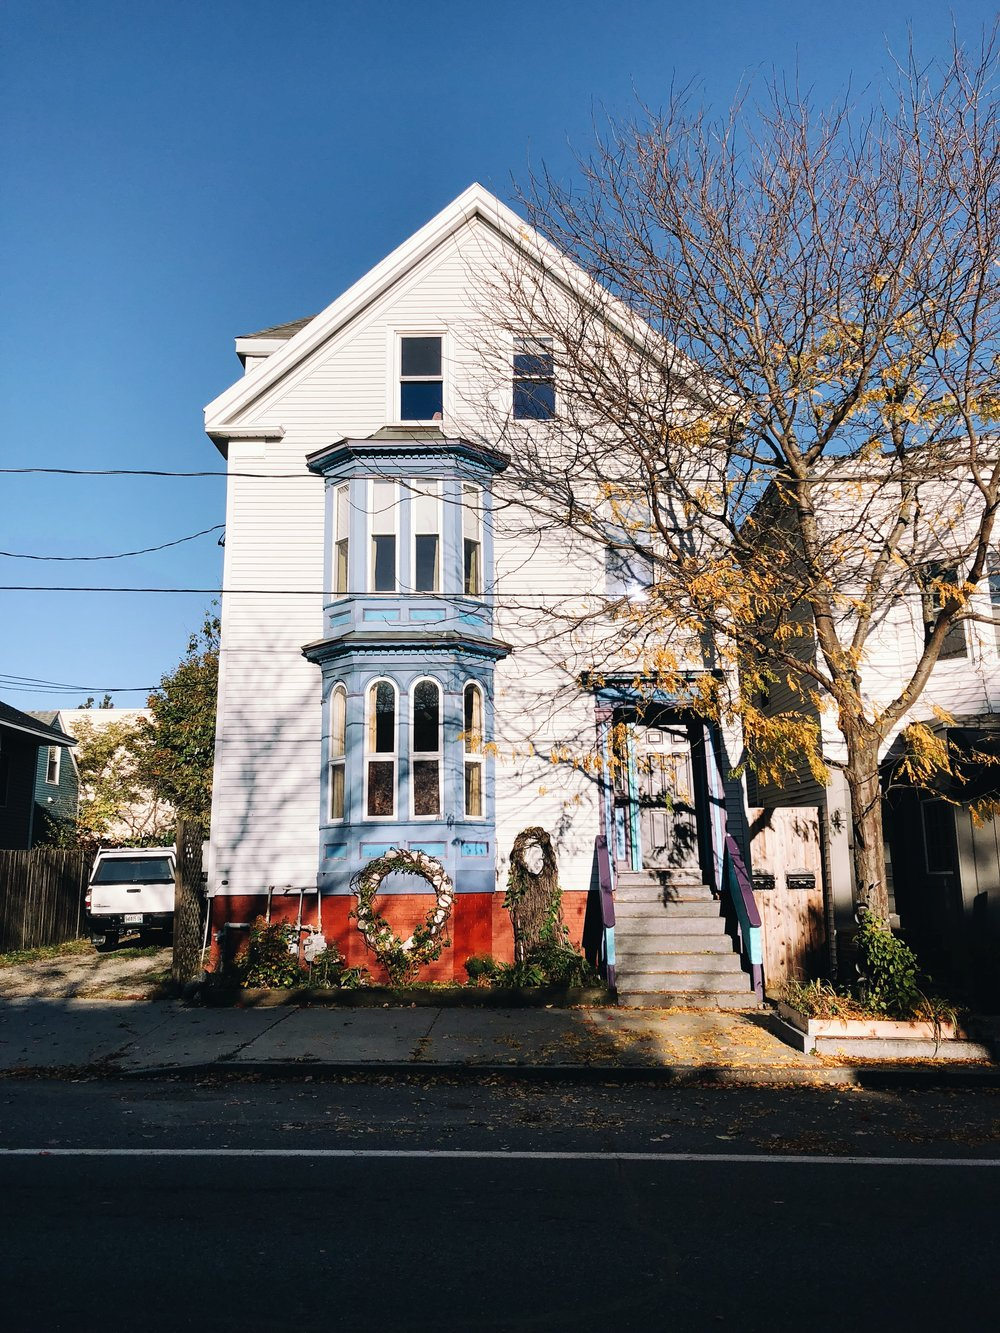 Walking through Munjoy Hill, a neighborhood in east Portland